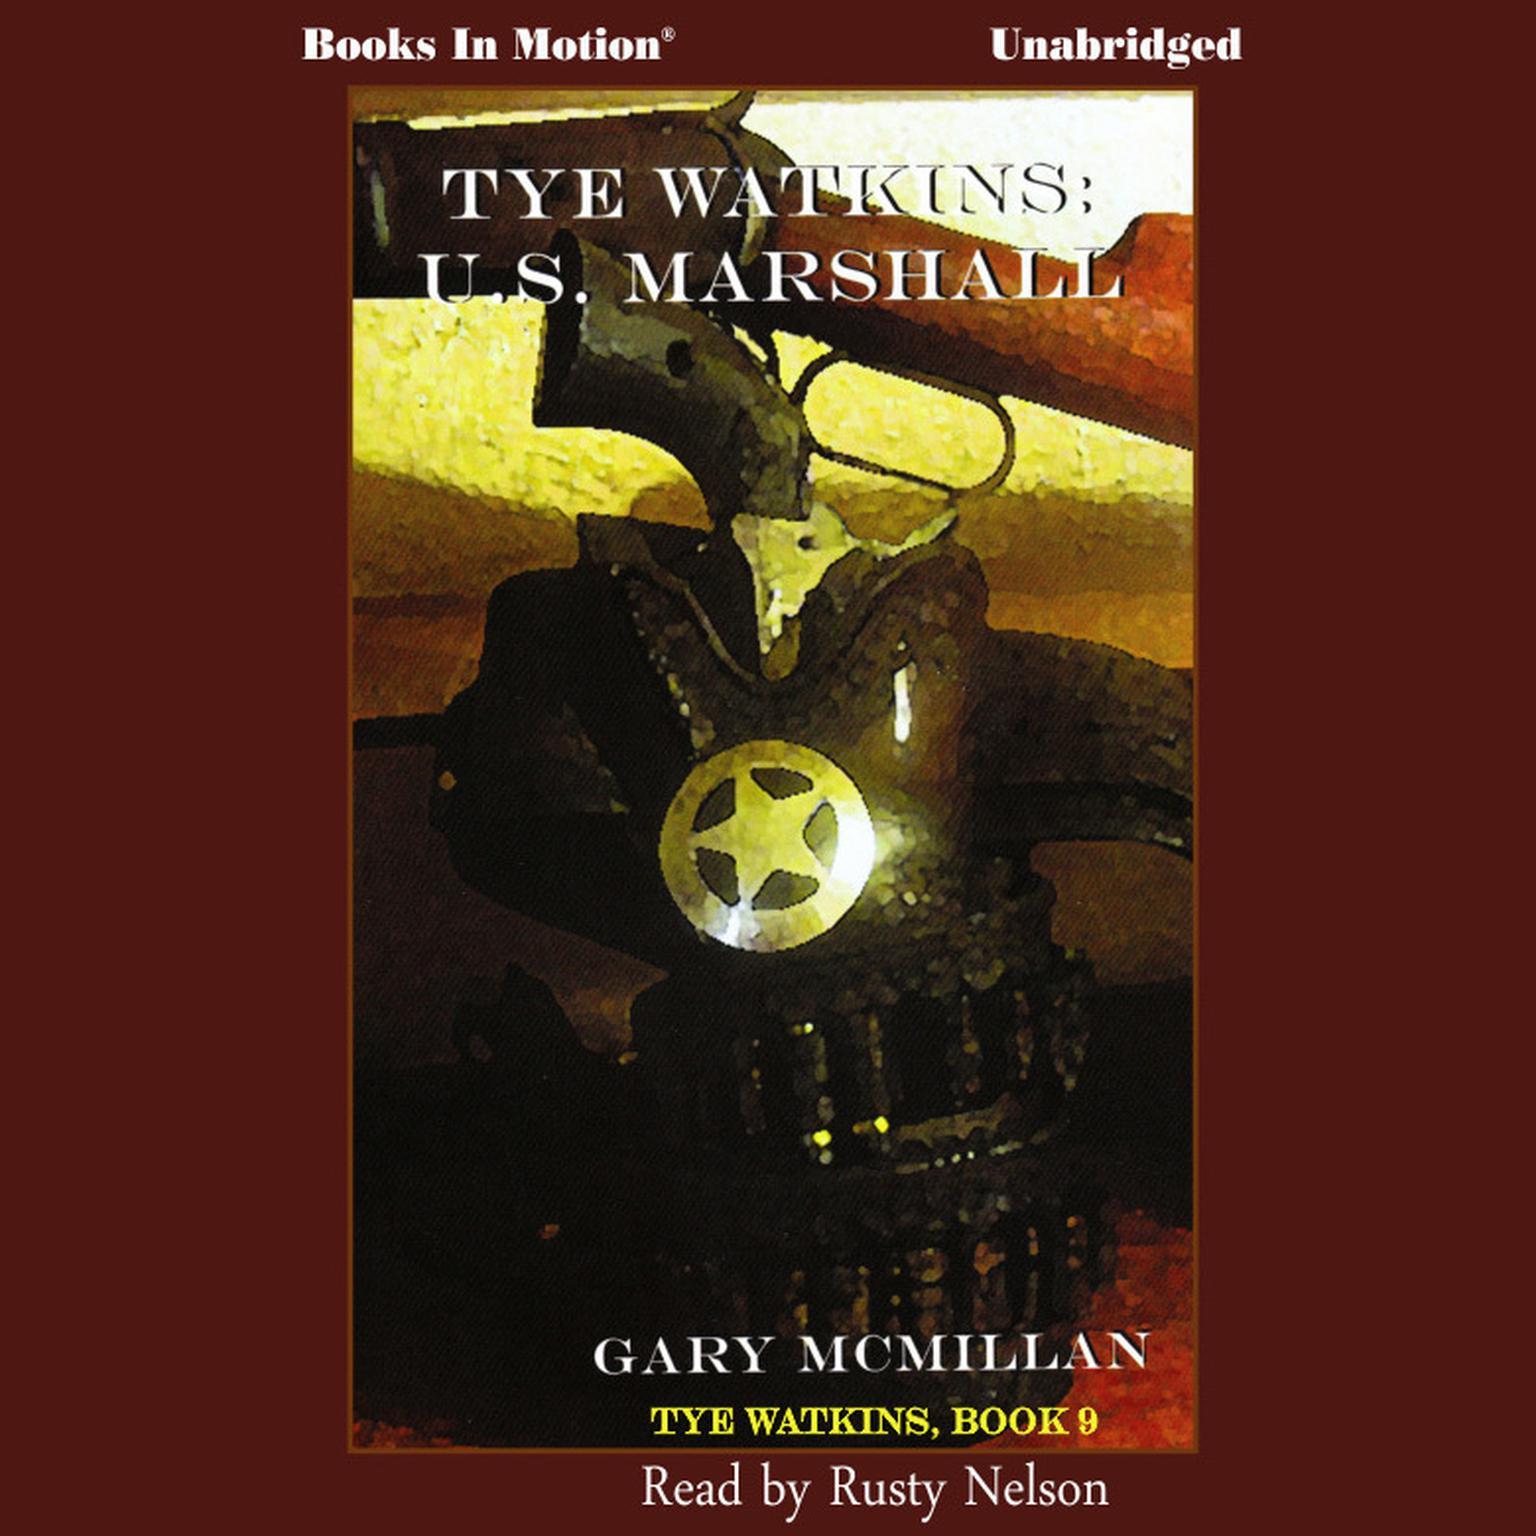 Tye Watkins: U.S Marshall Audiobook, by Gary McMillan